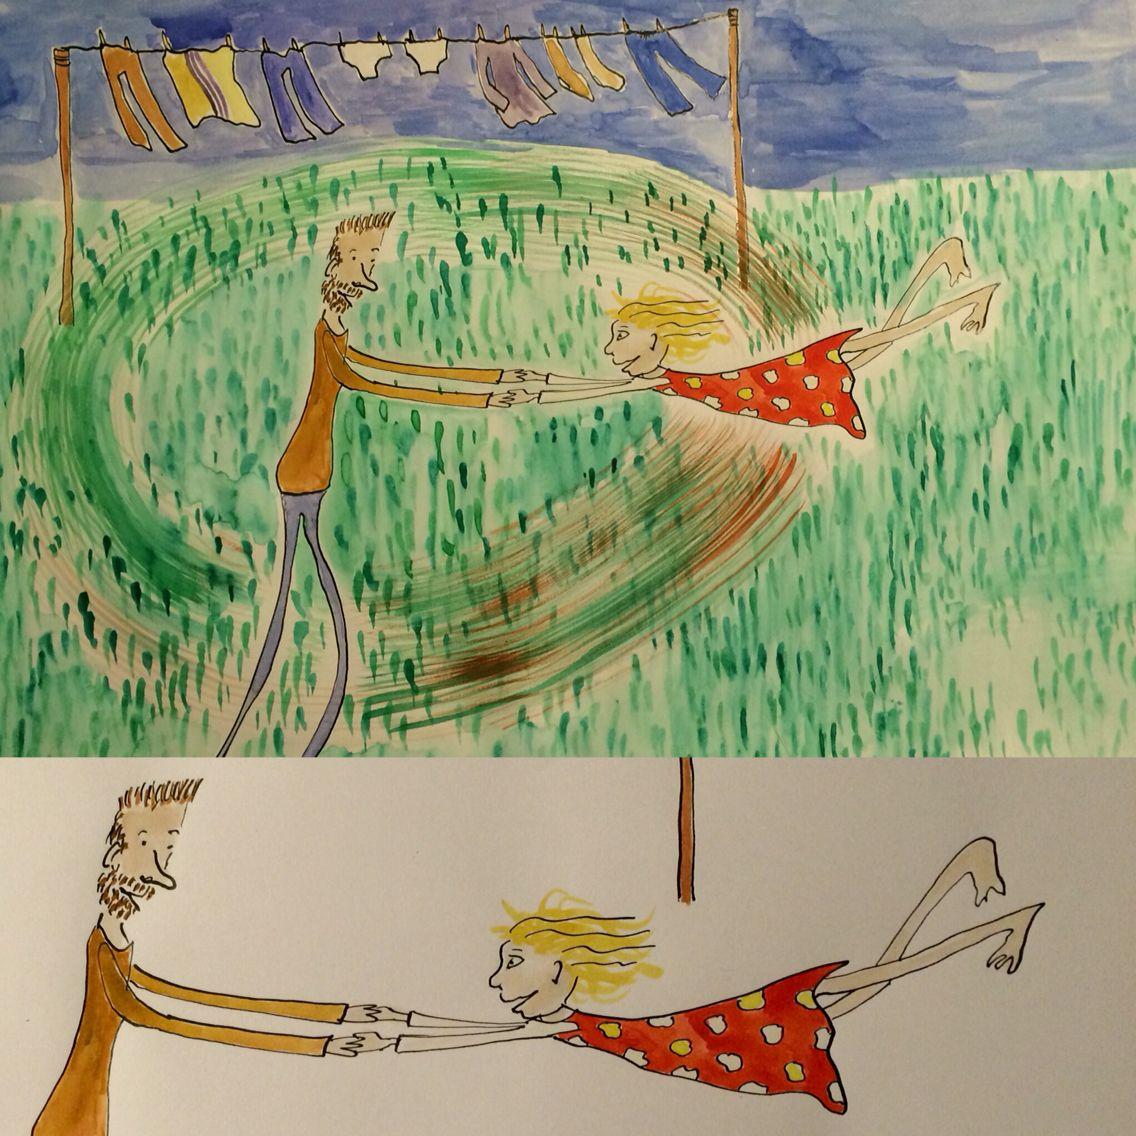 Spin - opdracht via #illustrationfriday - suzanvandelft